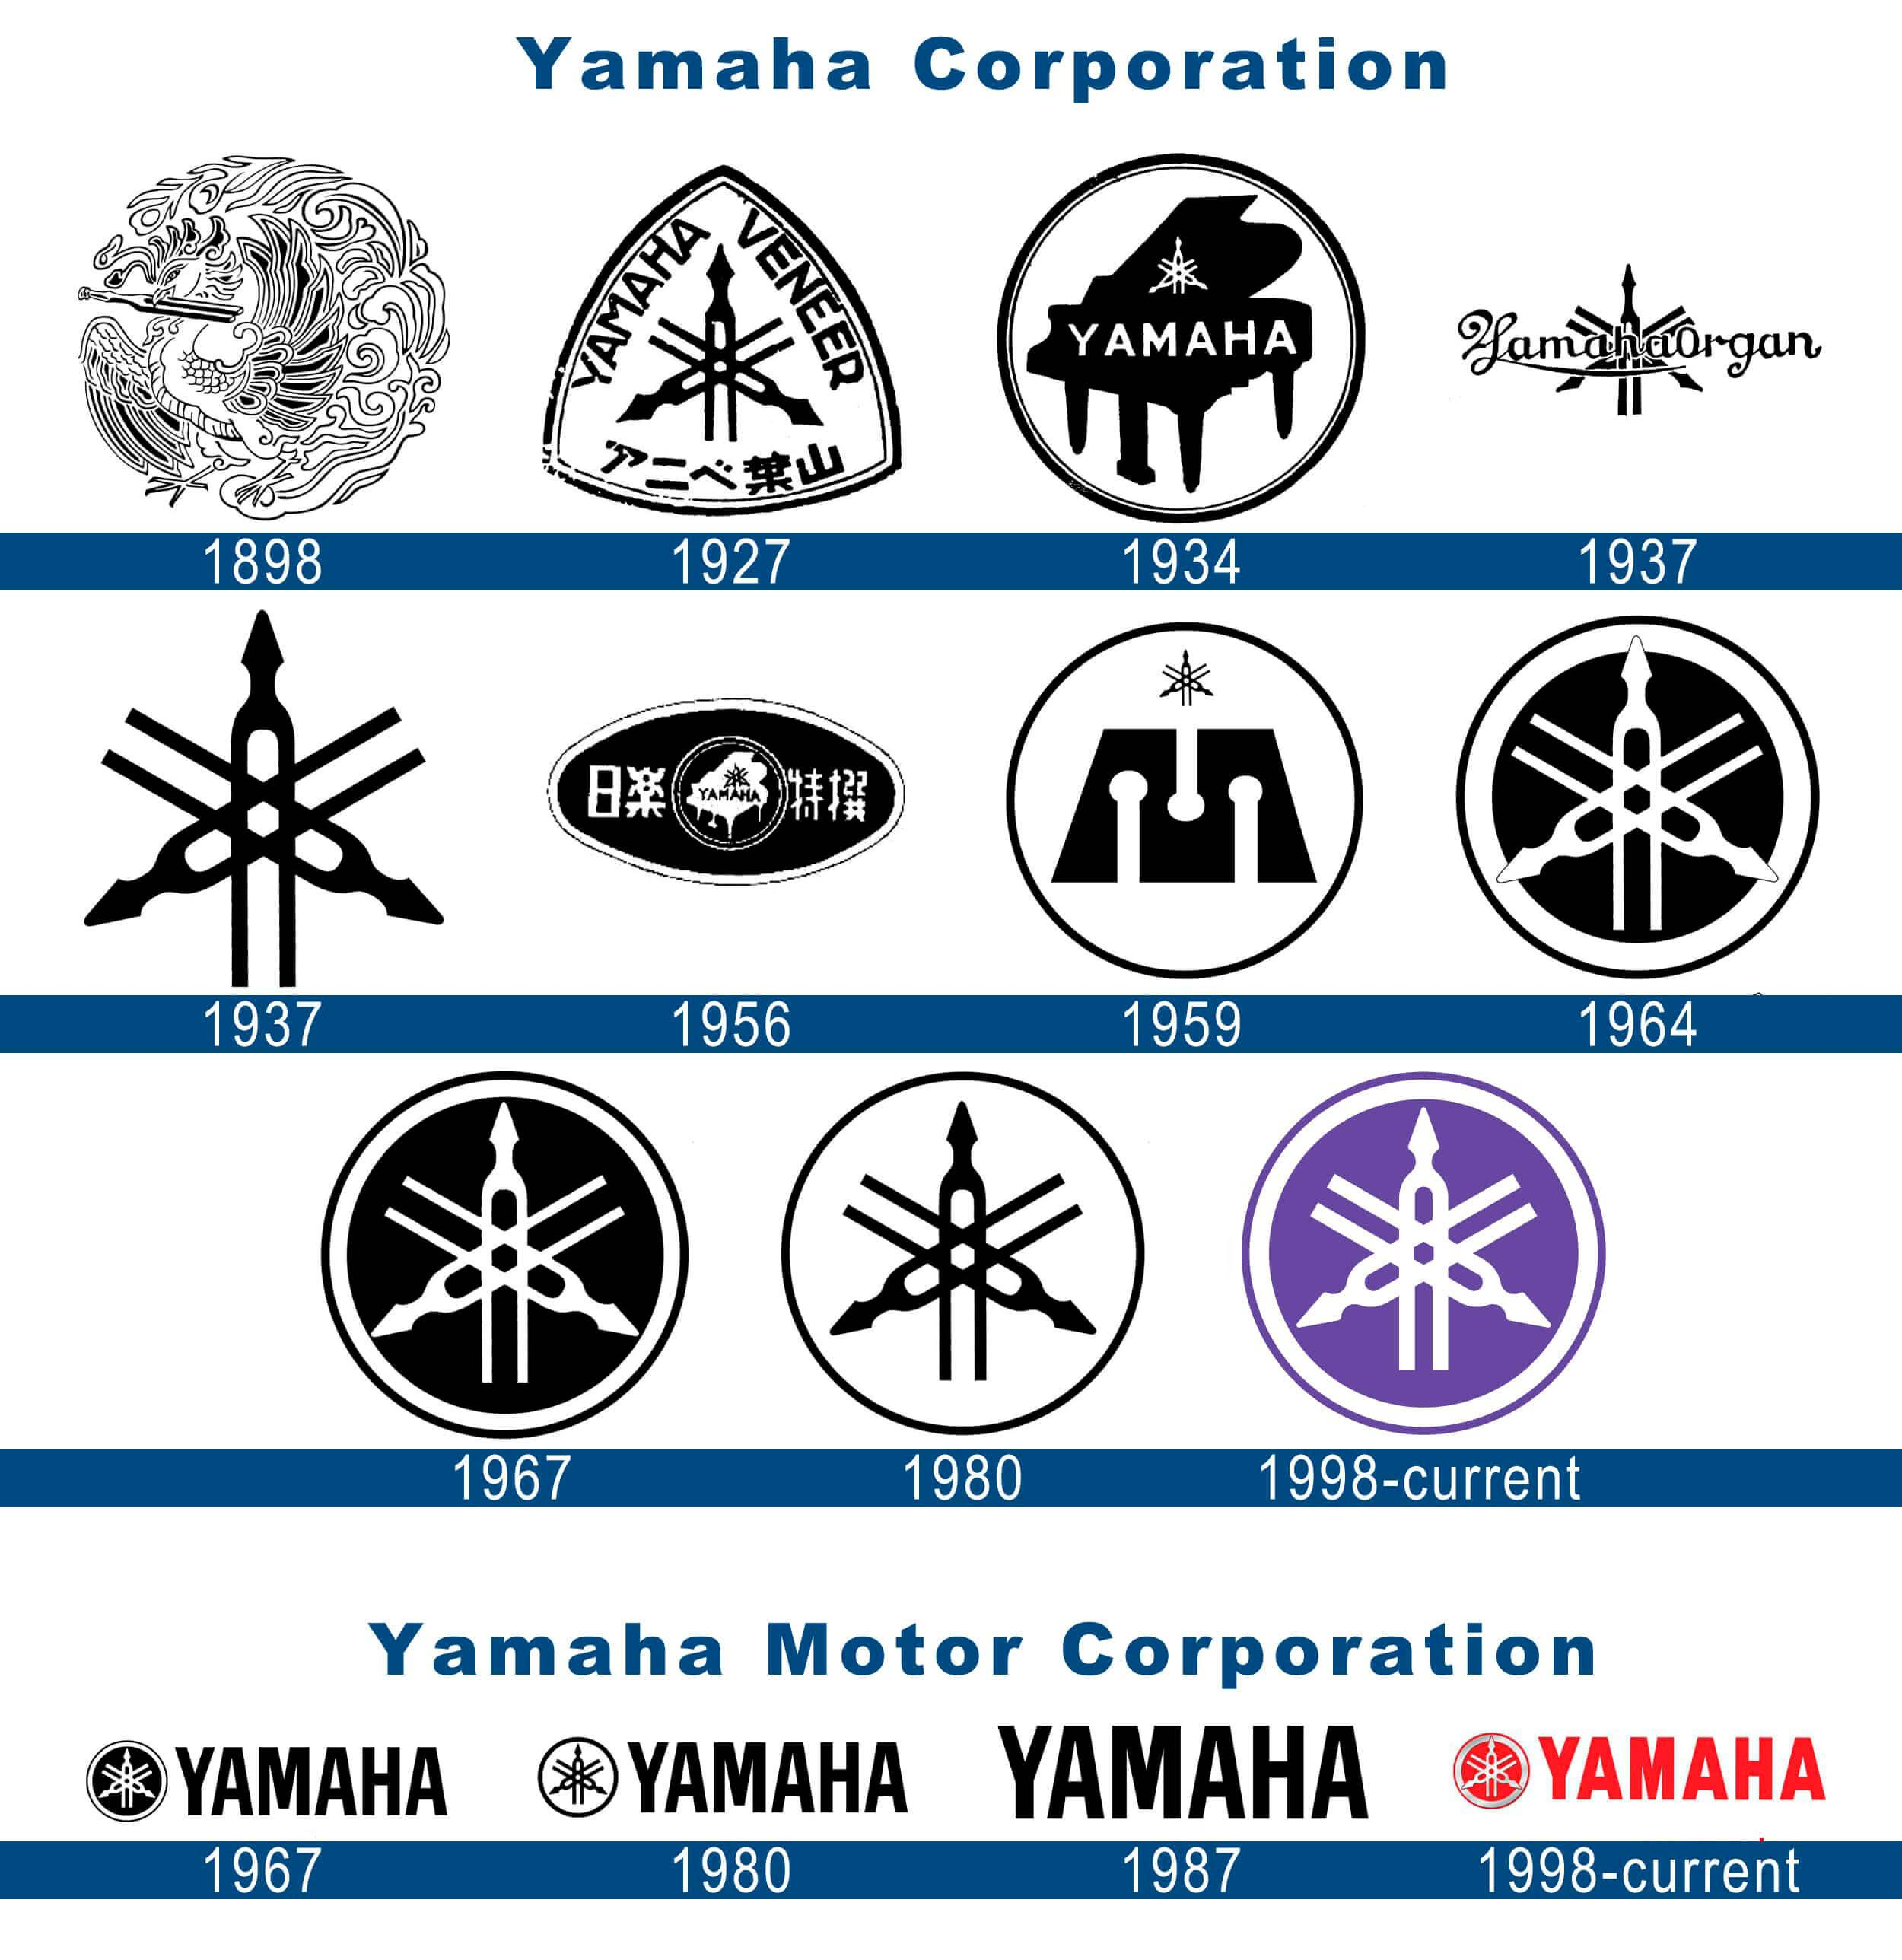 small resolution of yamaha logo history yamaha logo yamaha motorcycles cars and motorcycles motorcycle logo